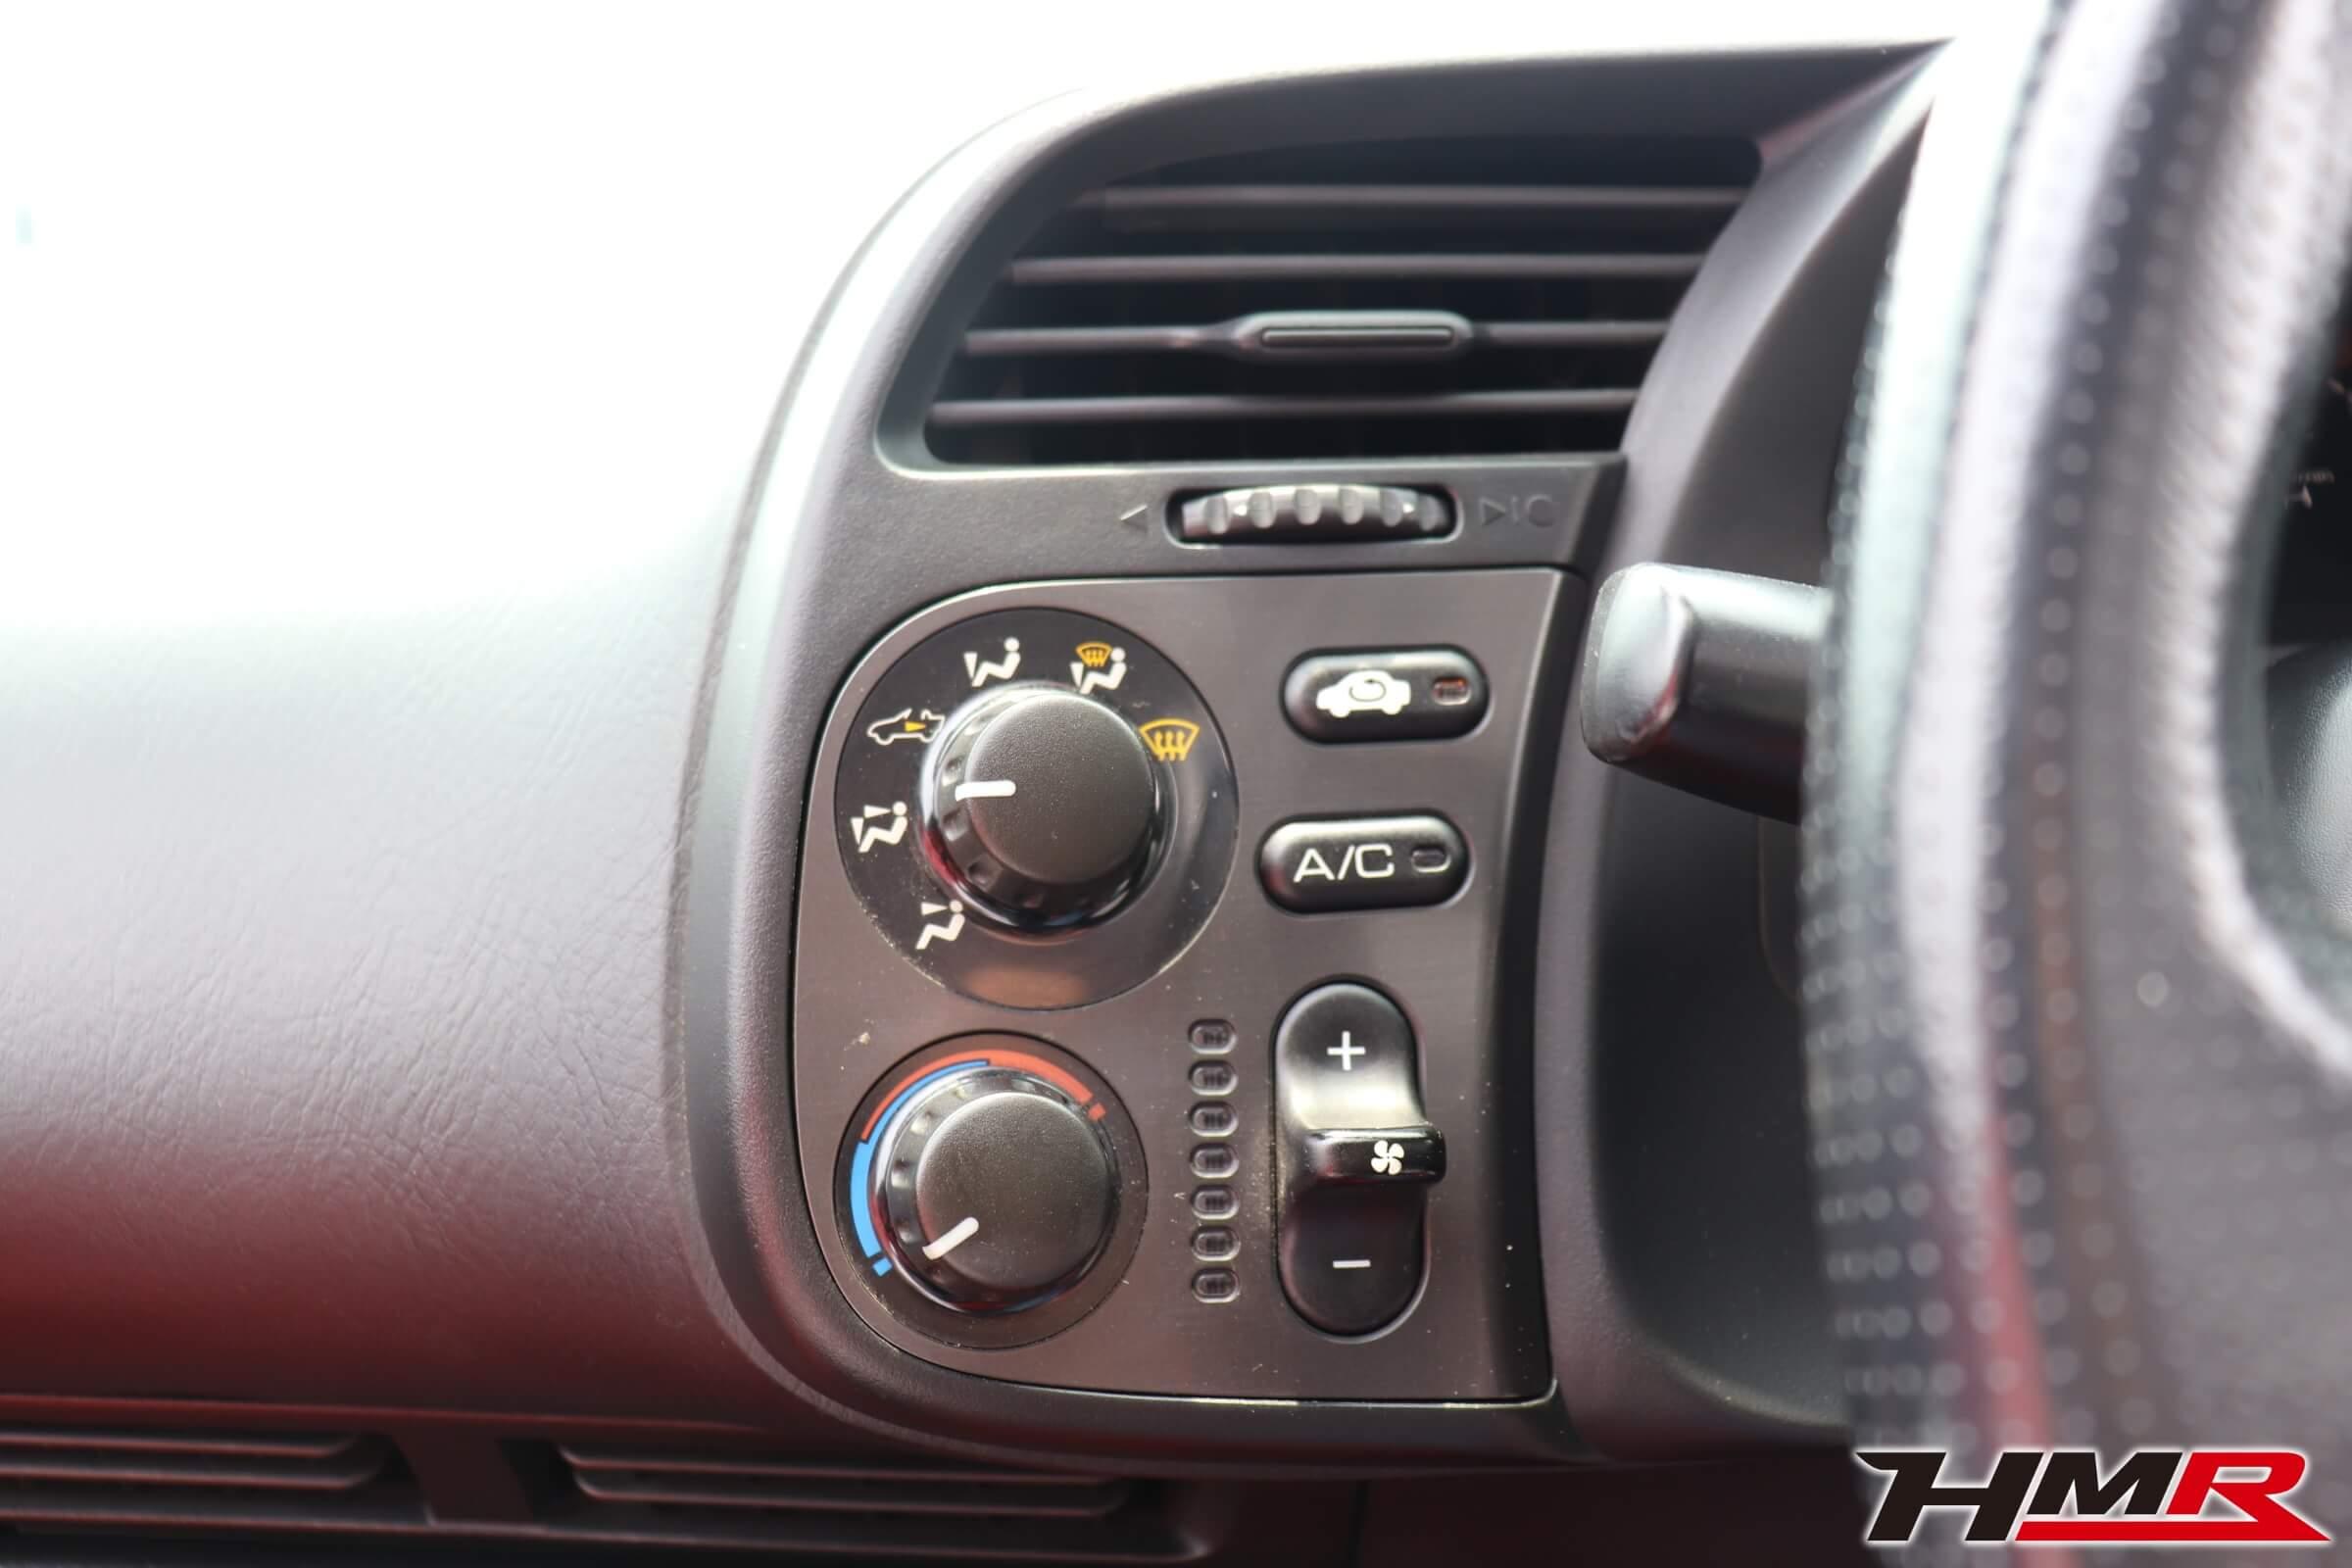 S2000(AP1)エアコンダイアル